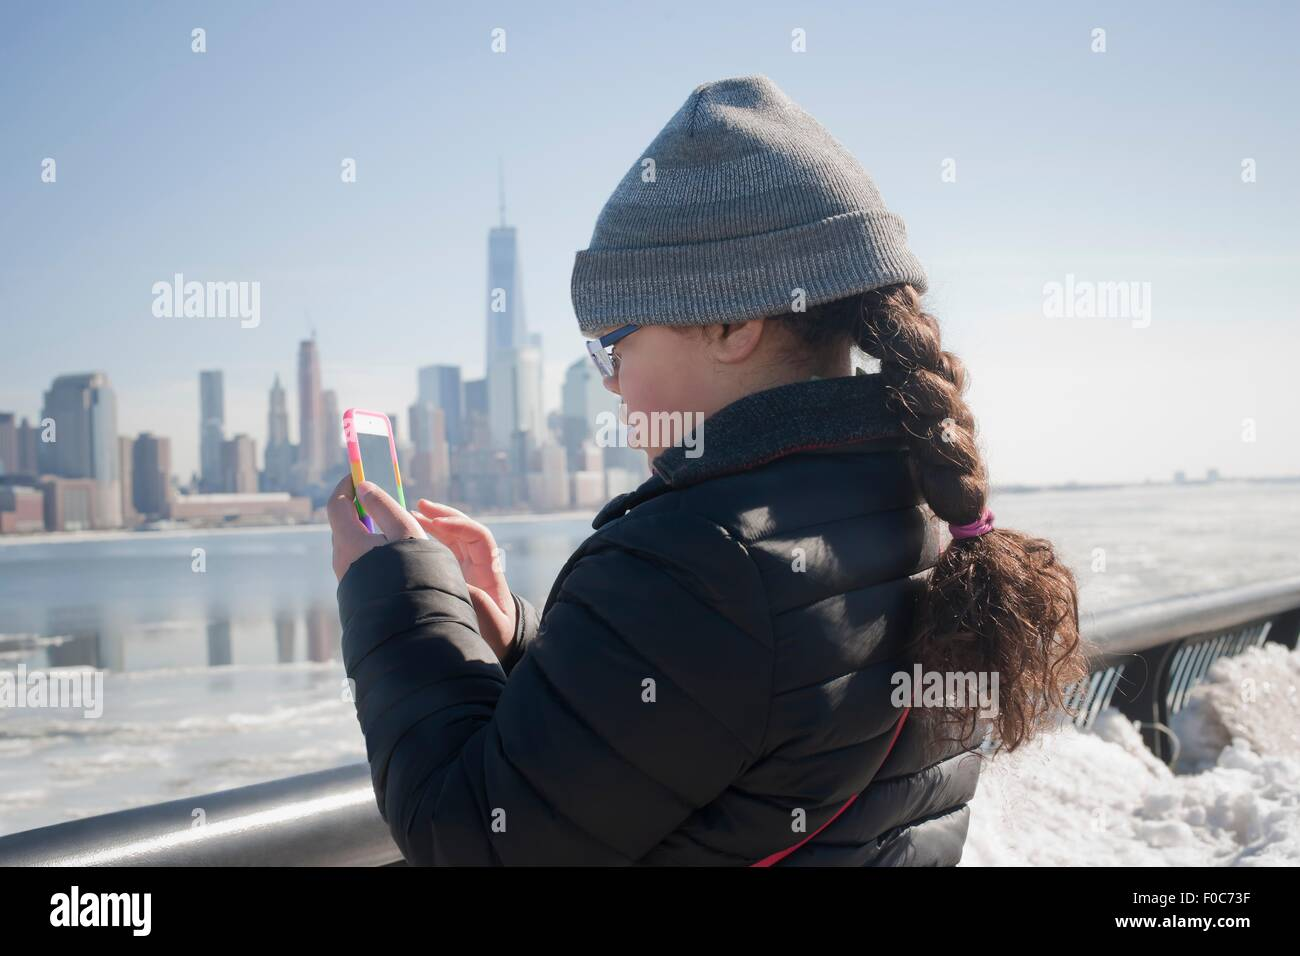 Junges Mädchen nehmen Foto Skyline mit Smartphone, New York, NY, USA Stockbild